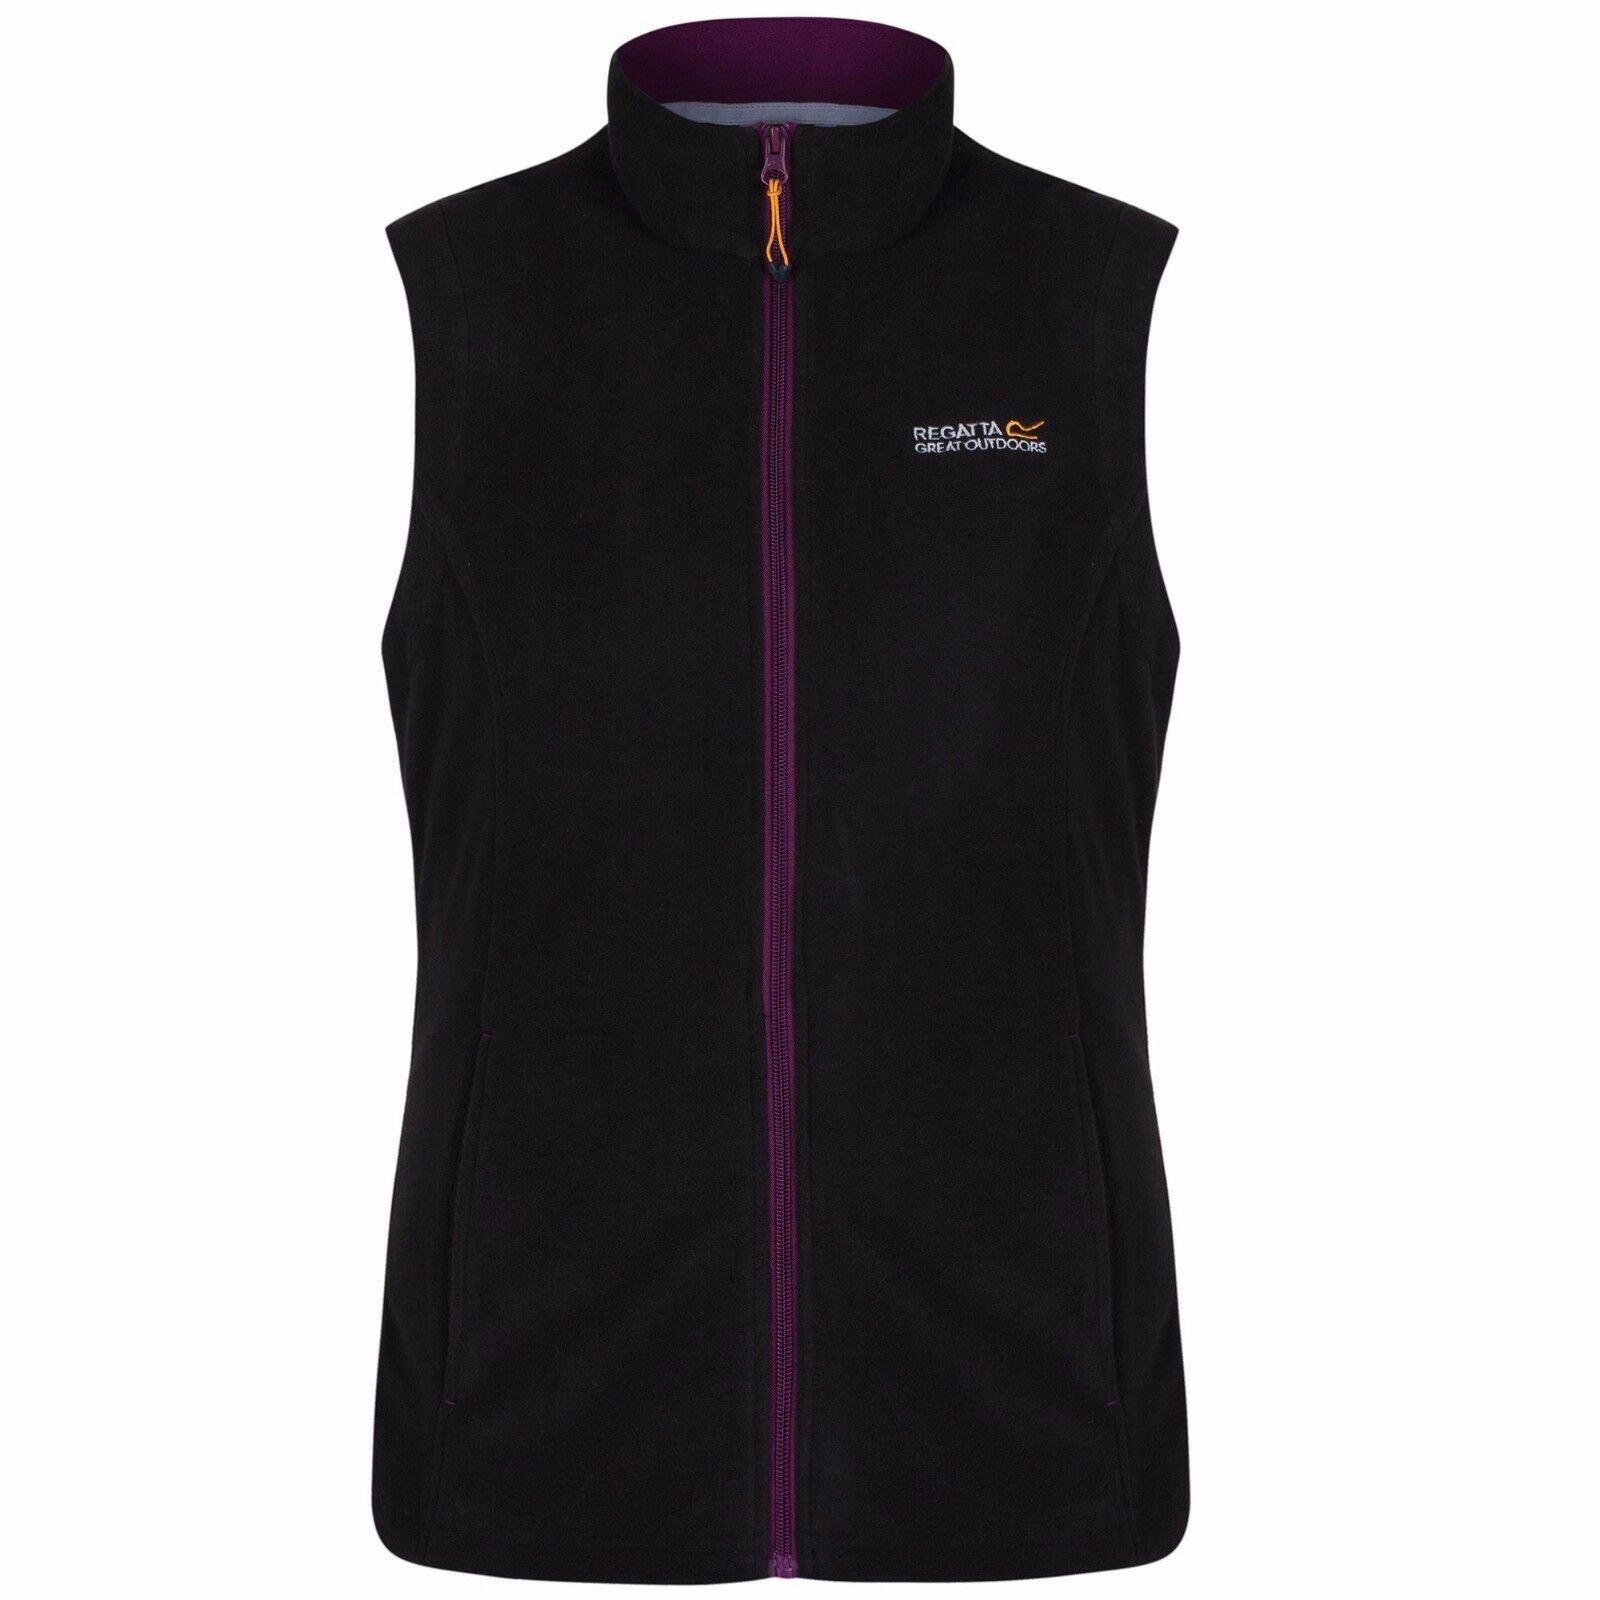 miniatuur 7 - Regatta Womens Sweetness Full Zip Micro Fleece Casual Bodywarmer Waistcoat